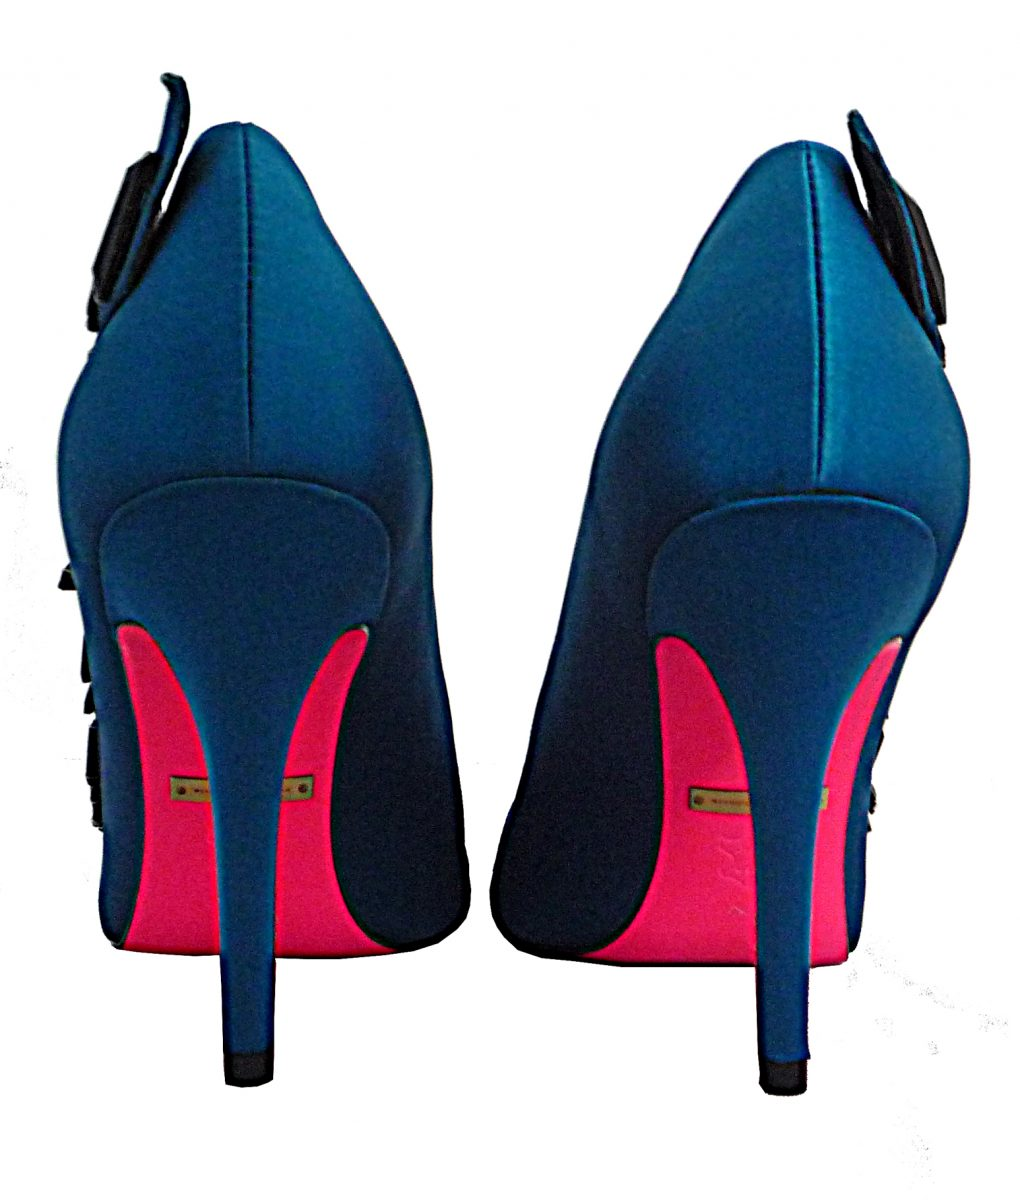 Alila Teal Silk Open Toe Shoe by Suecomma Bonnie